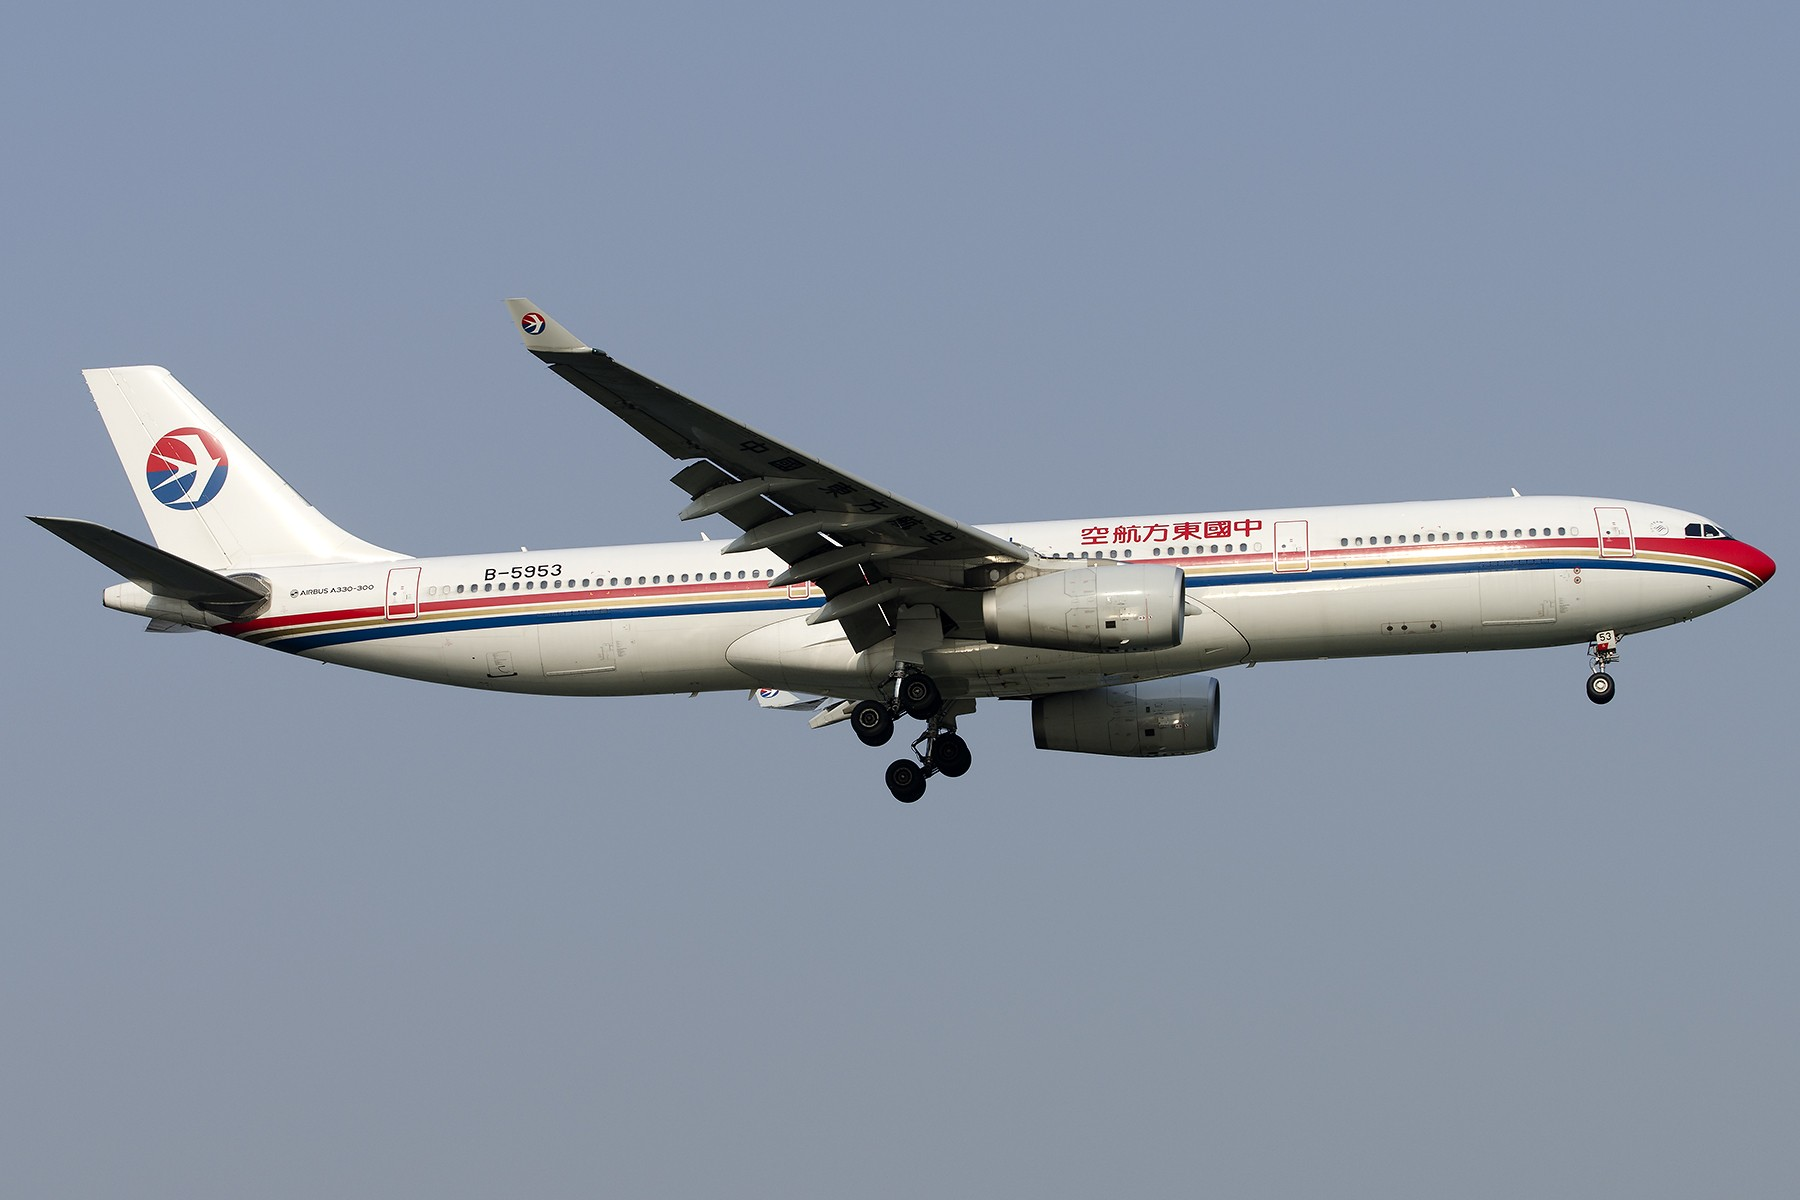 Re:[原创][原创]【SHA拍机*1800大图】4月拍的了,记得那天好货还挺多 AIRBUS A330-300 B-5953 中国上海虹桥国际机场